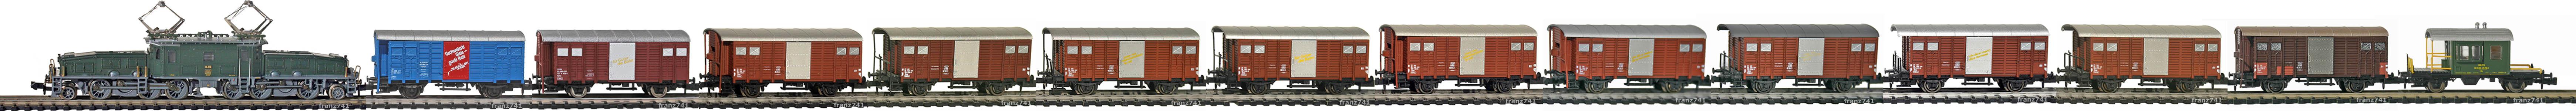 Epoche-III-SBB-Gueterzug_Ce-6-8-III-Elok-Gms-Gueterwagen